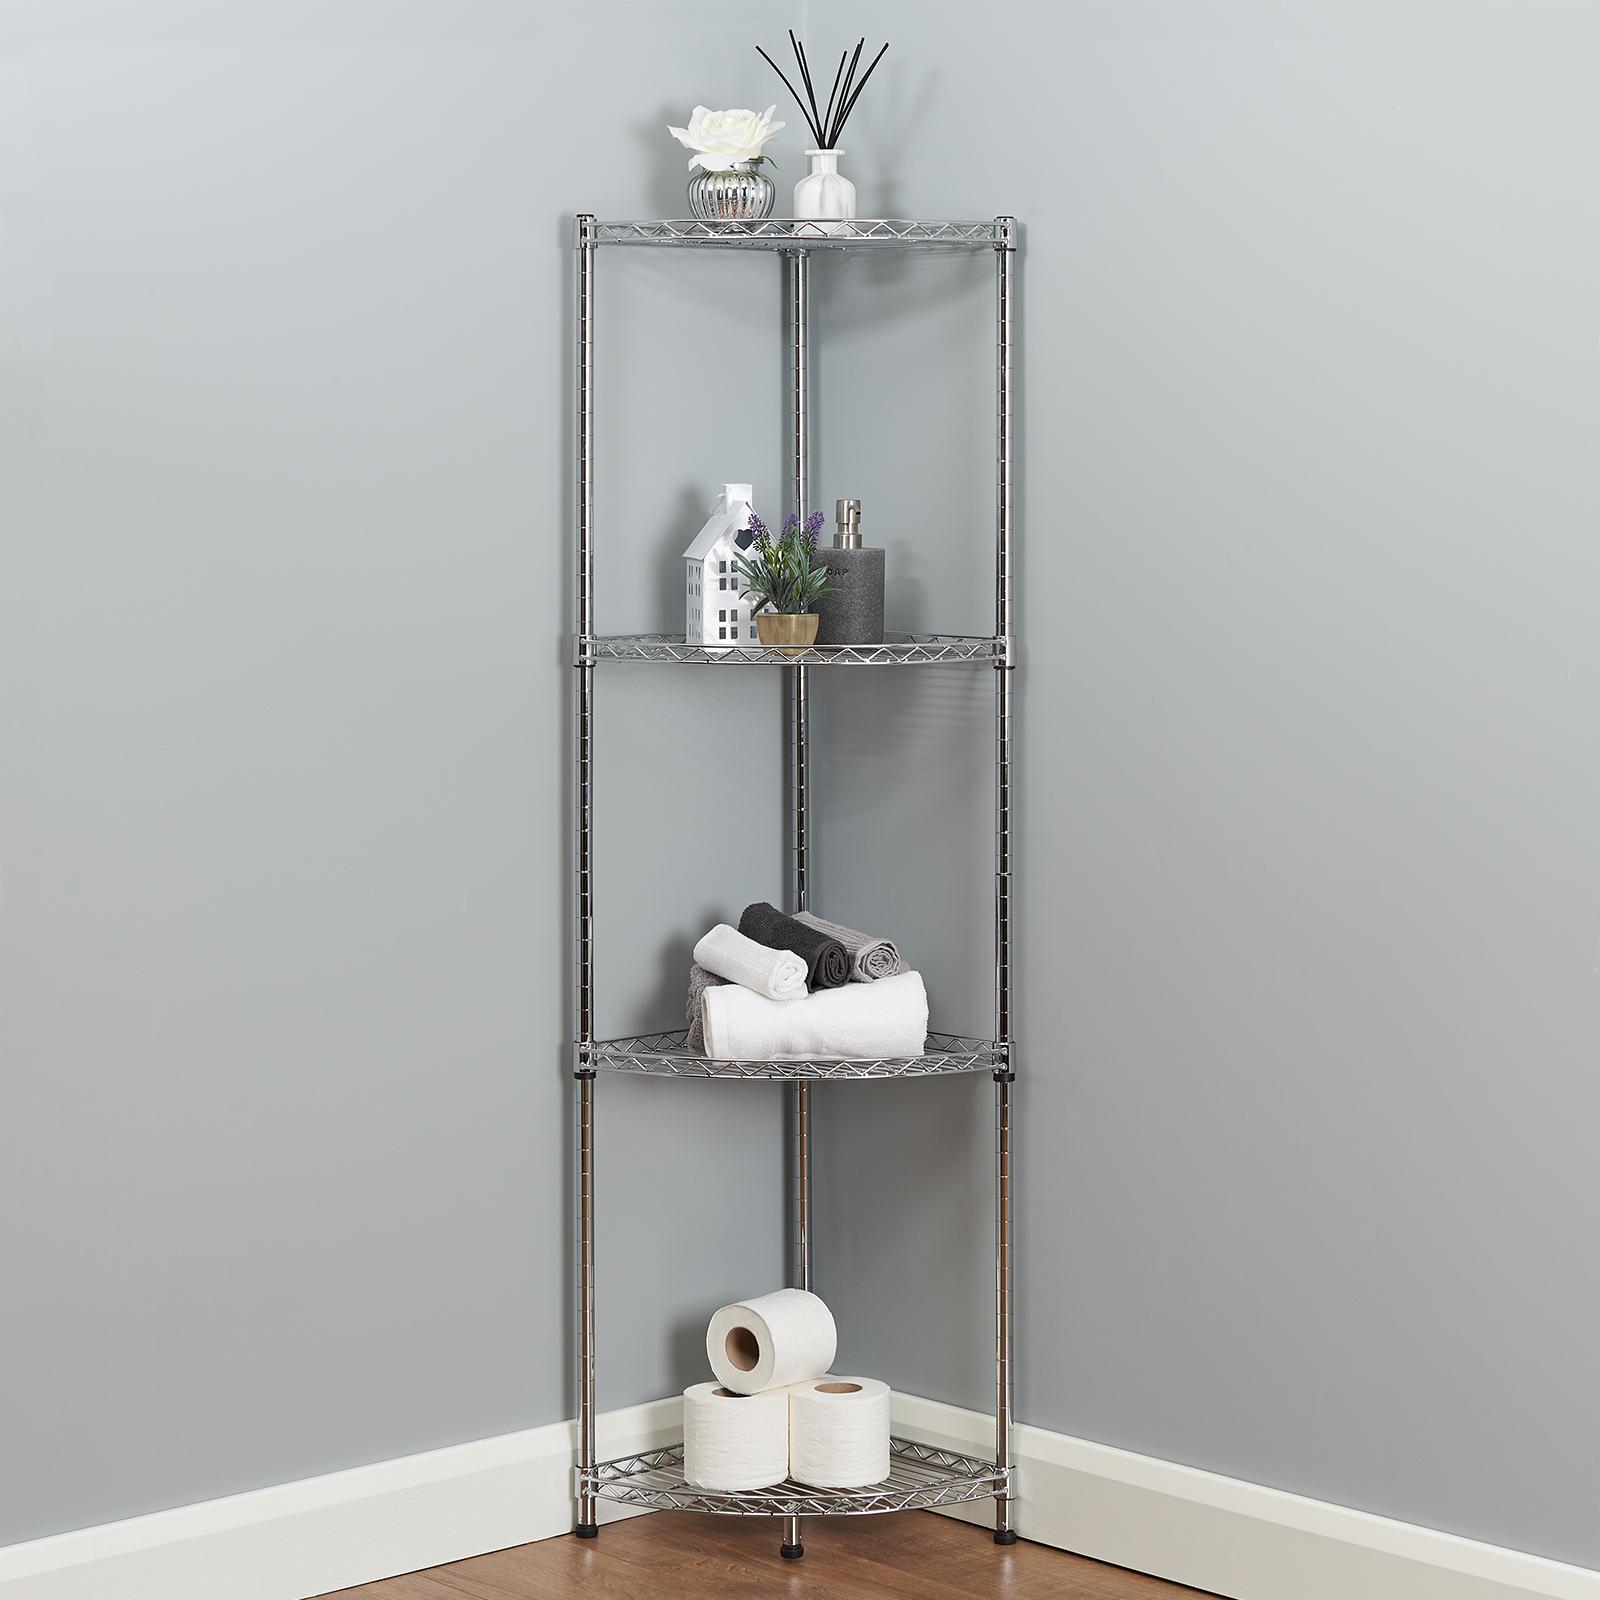 Details About 4 Tier Corner Bathroom Storage Shelves Metal Chrome Shelving Unit Display Rack inside sizing 1600 X 1600